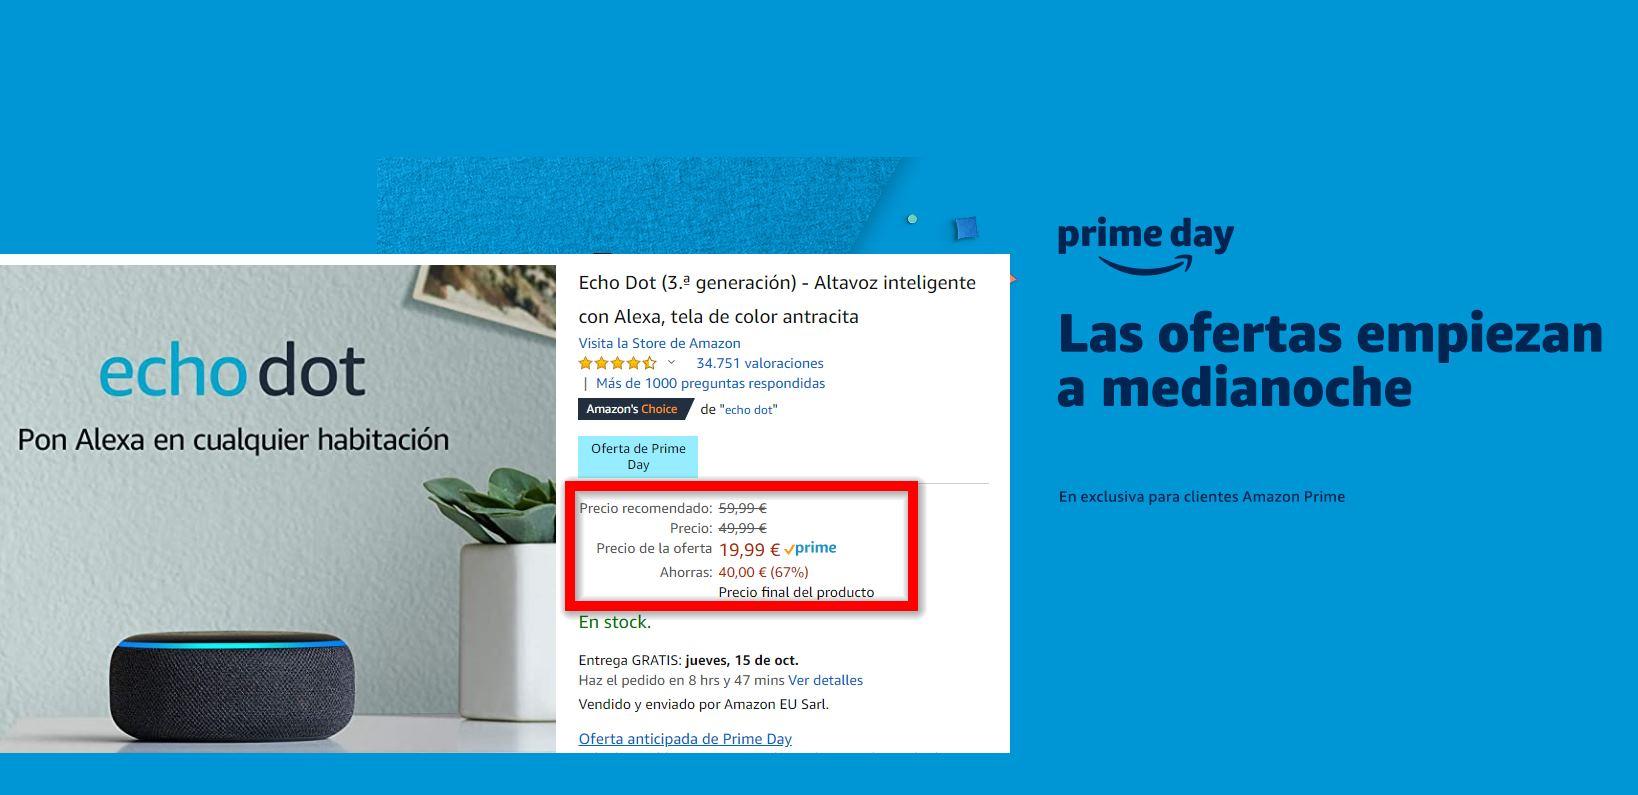 Amazon Prime Day, dos días de ofertas para volver loco al consumidor